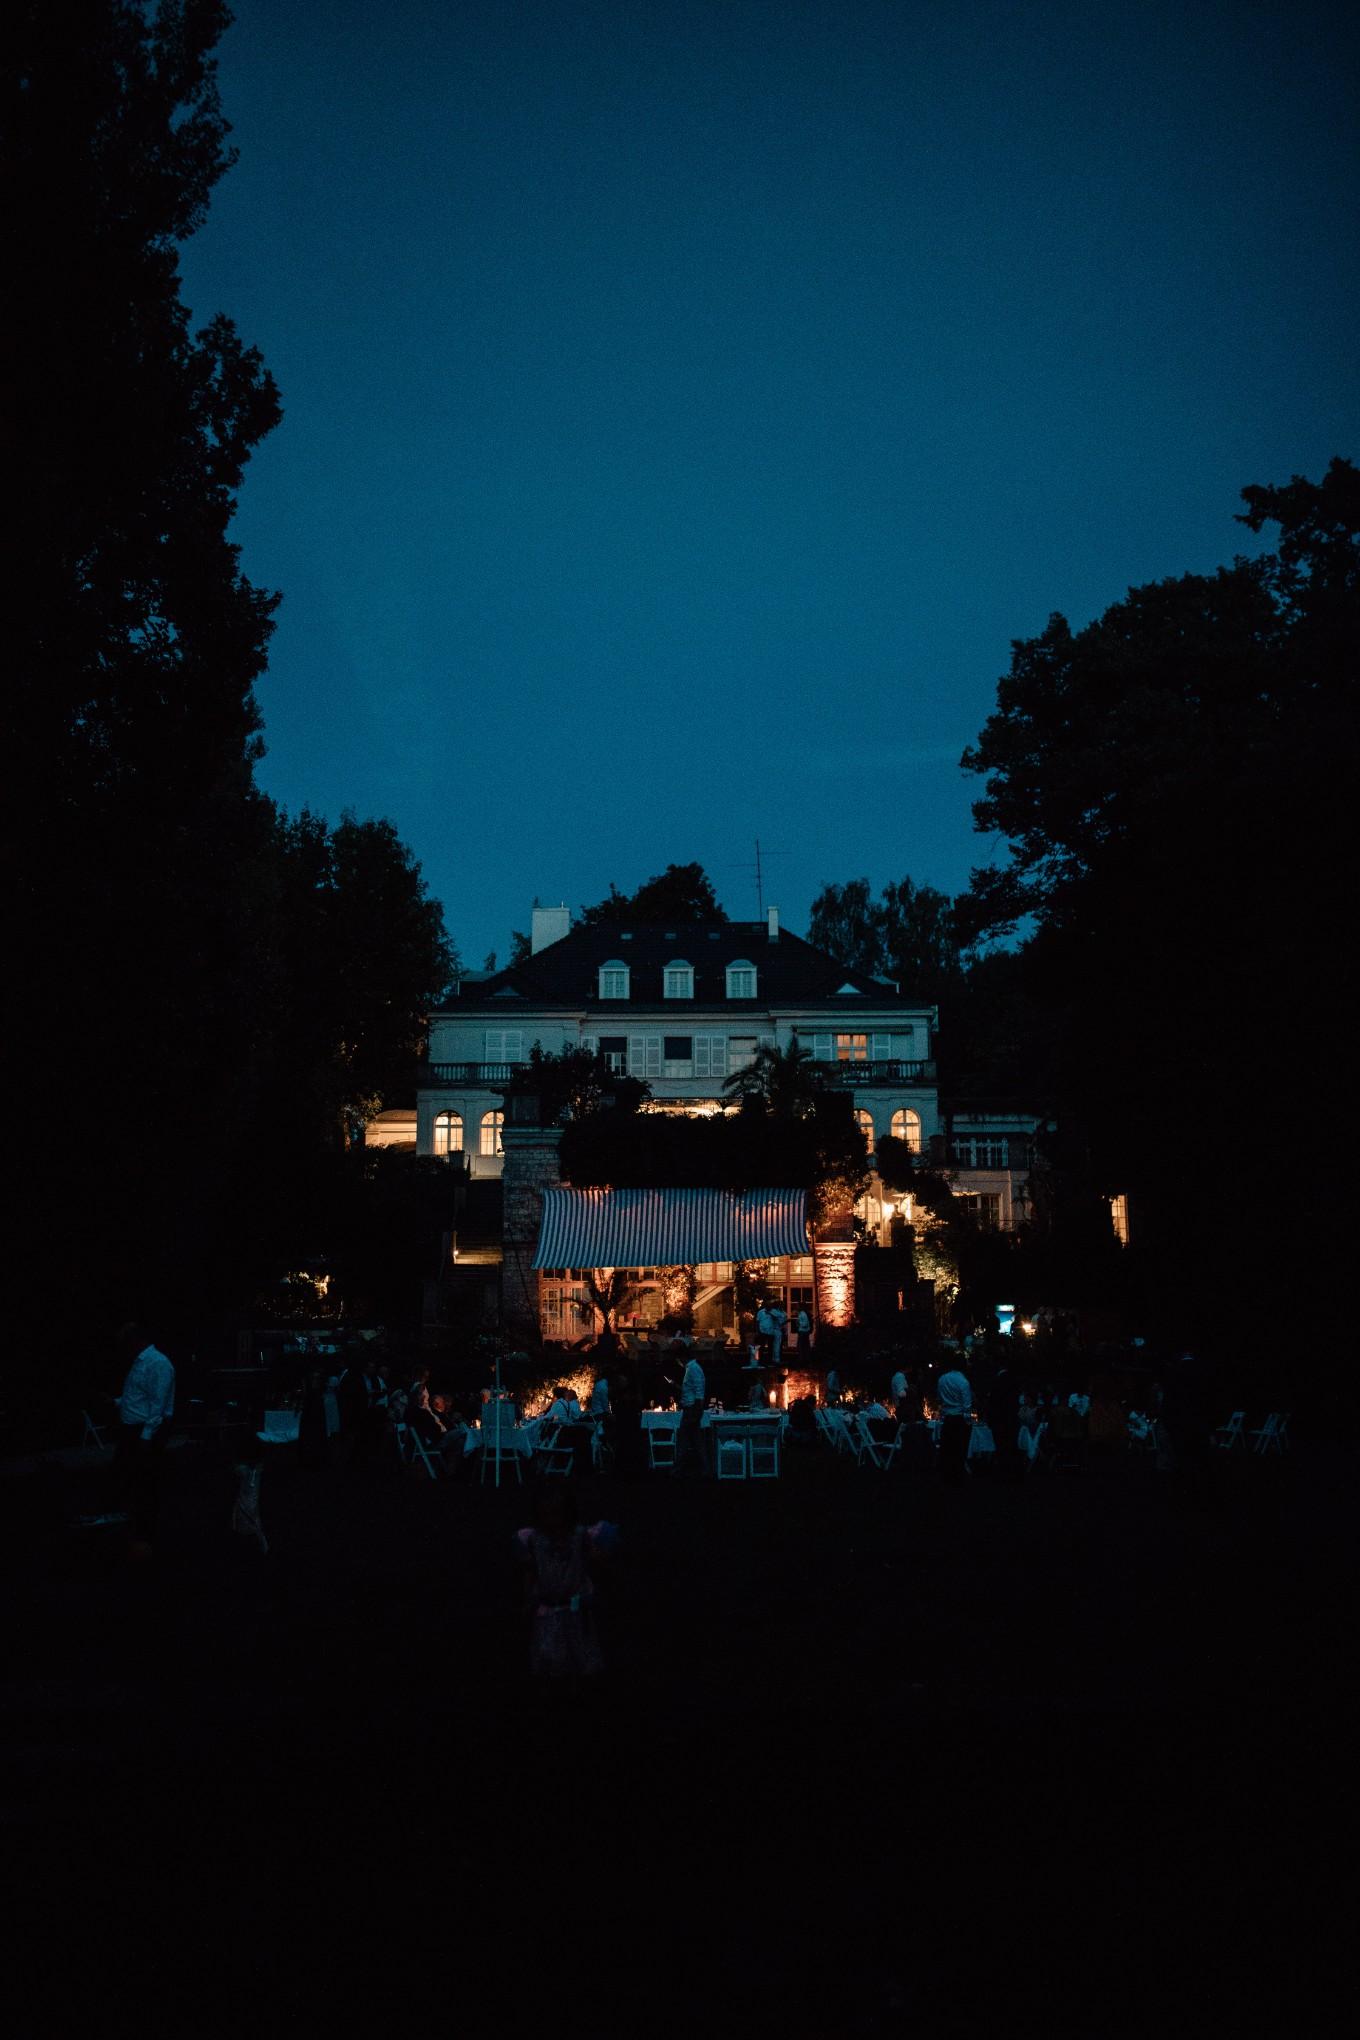 Berlin-Wannsee-Pia-Anna-Christian-Wedding-Photography-ST-99.jpg